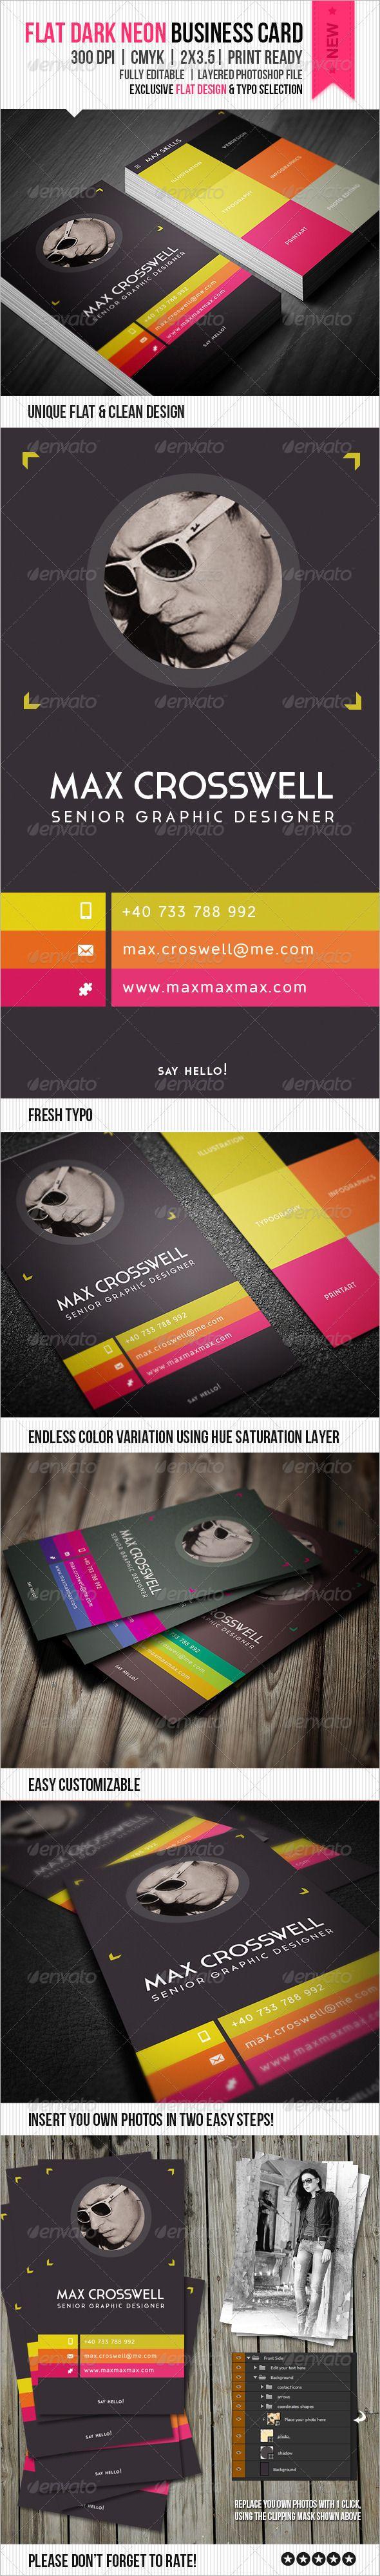 91 best print templates images on pinterest print templates font flat dark neon business card reheart Gallery